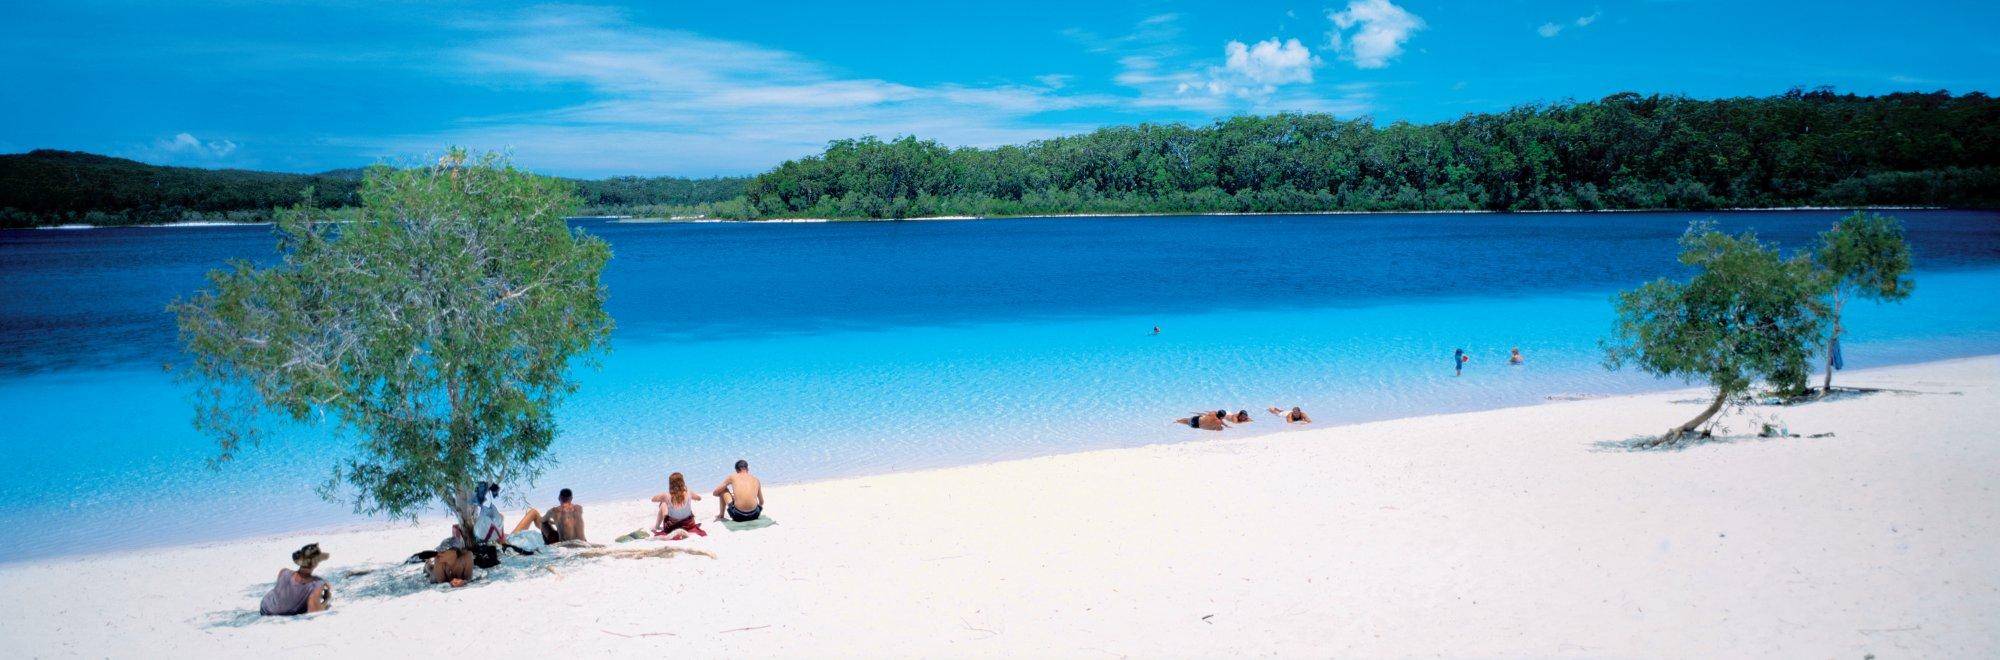 Regions_Fraser Island_2